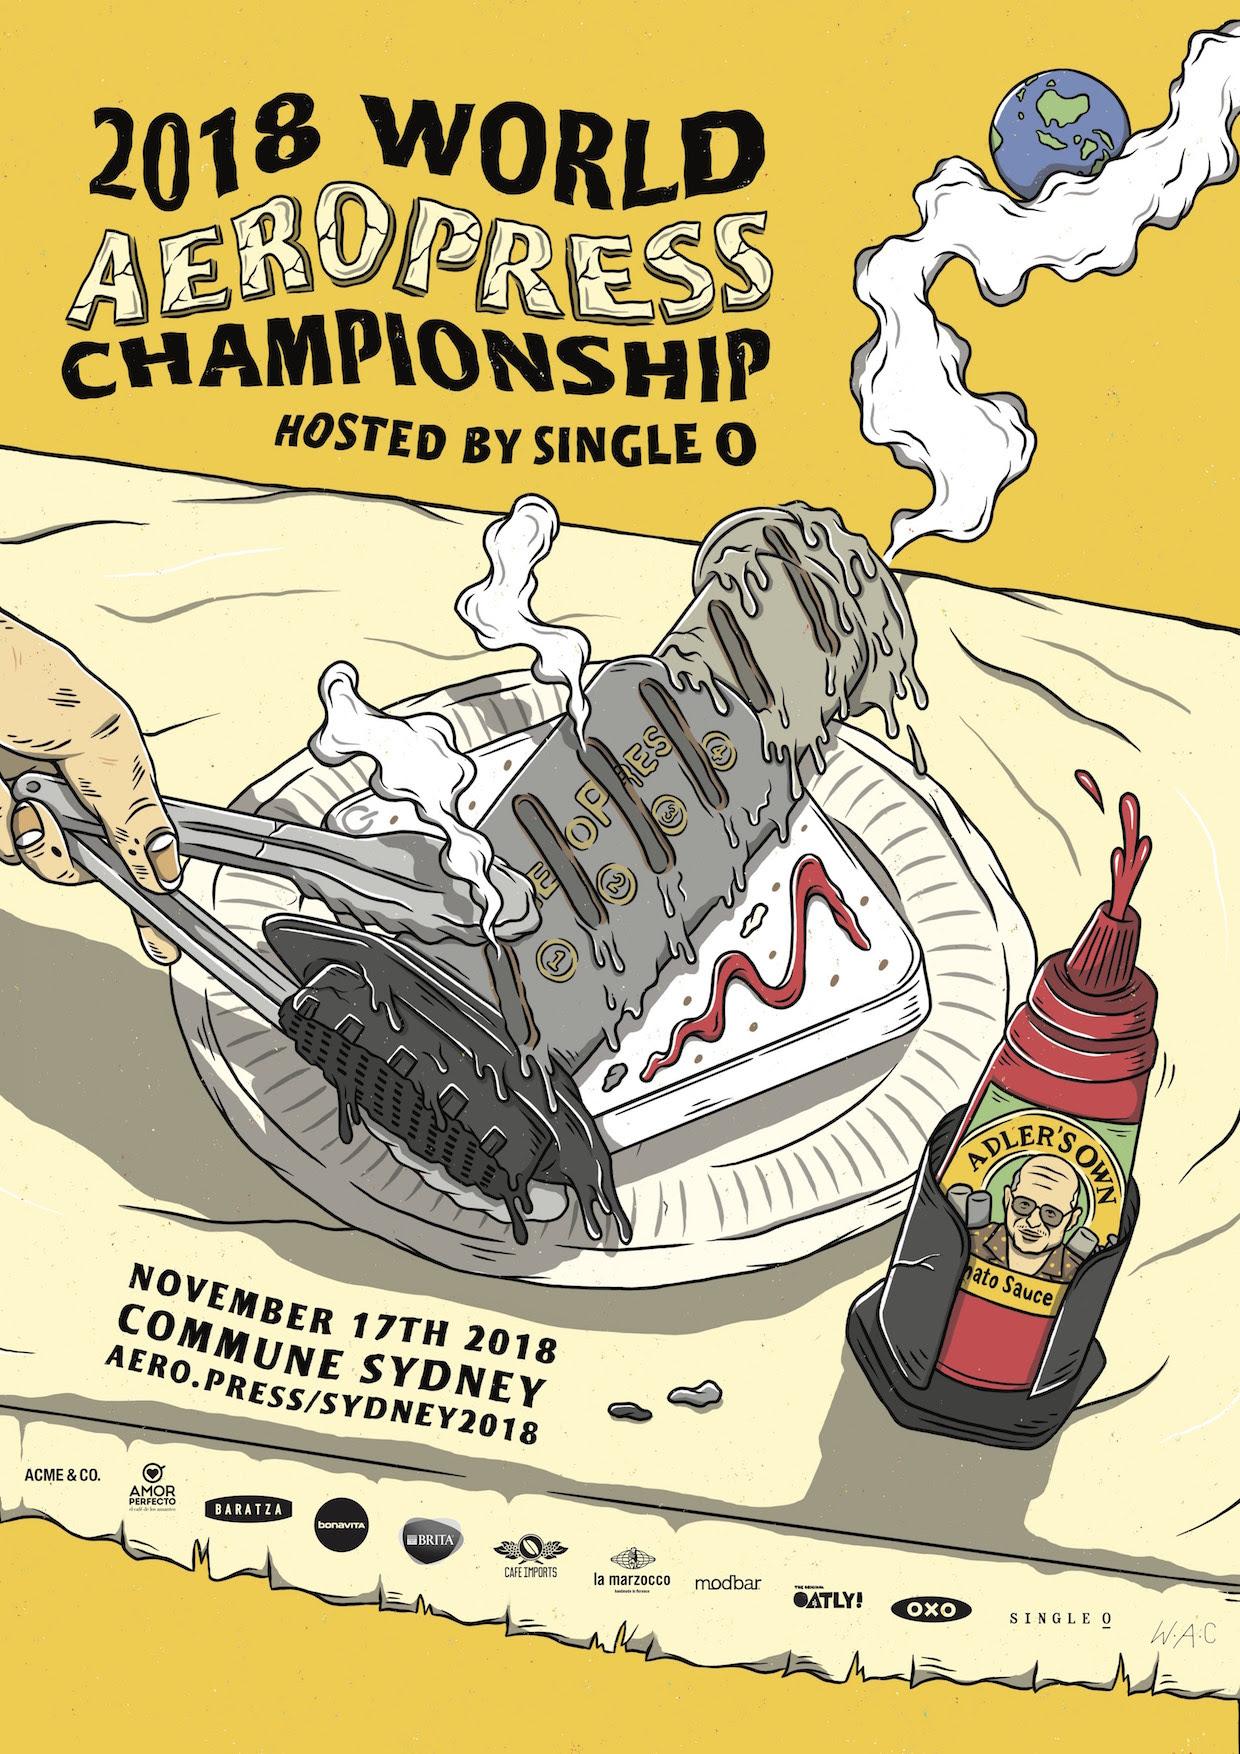 2018 World Aeropress Championship Heading To Sydney Australiadaily Coffee News By Roast Magazine